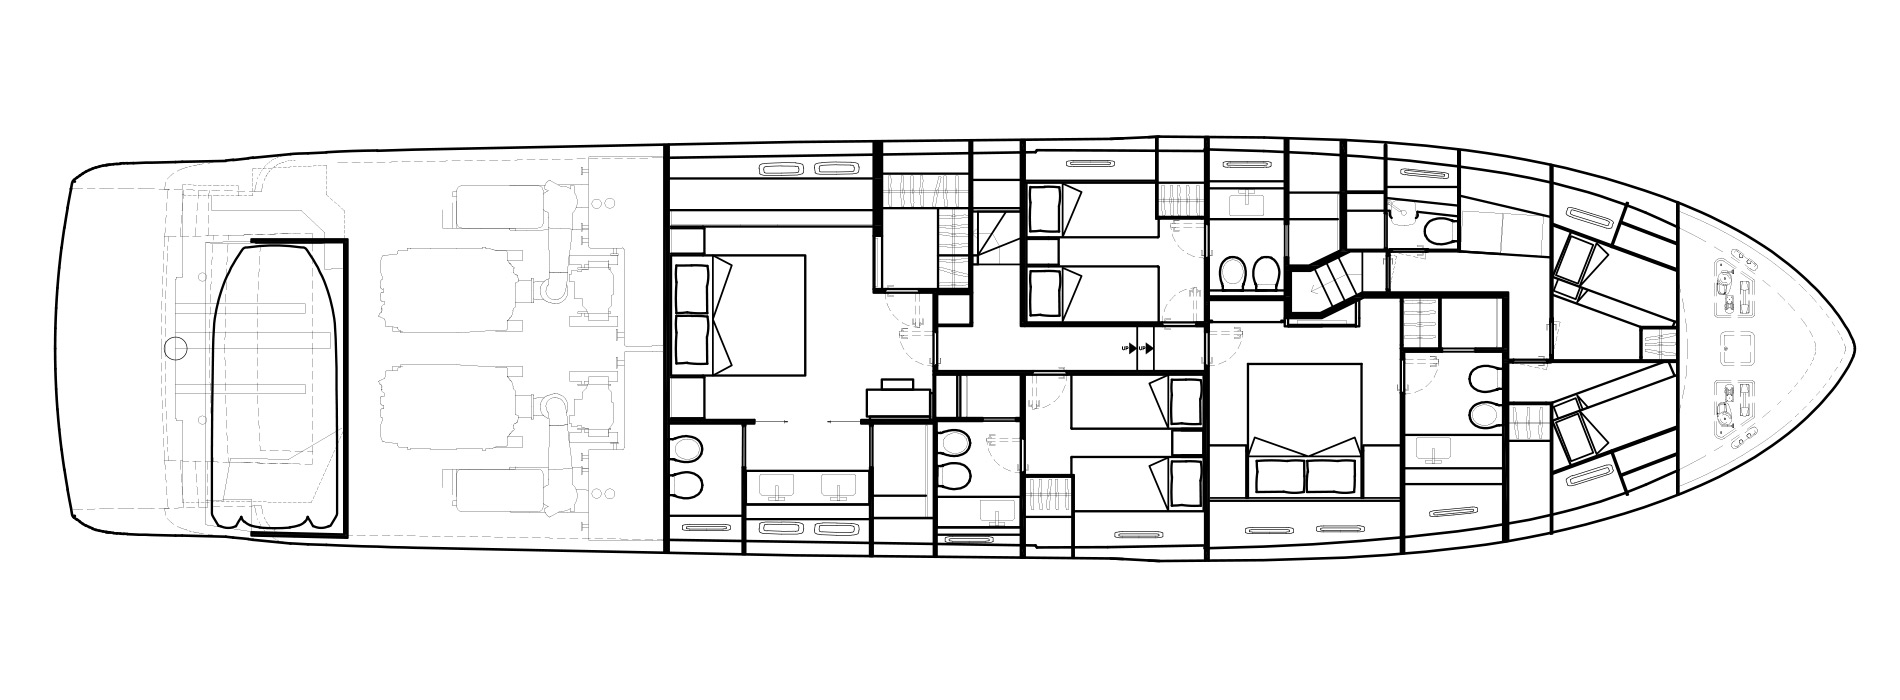 Sanlorenzo Yachts SL86 Lower Deck Versione A